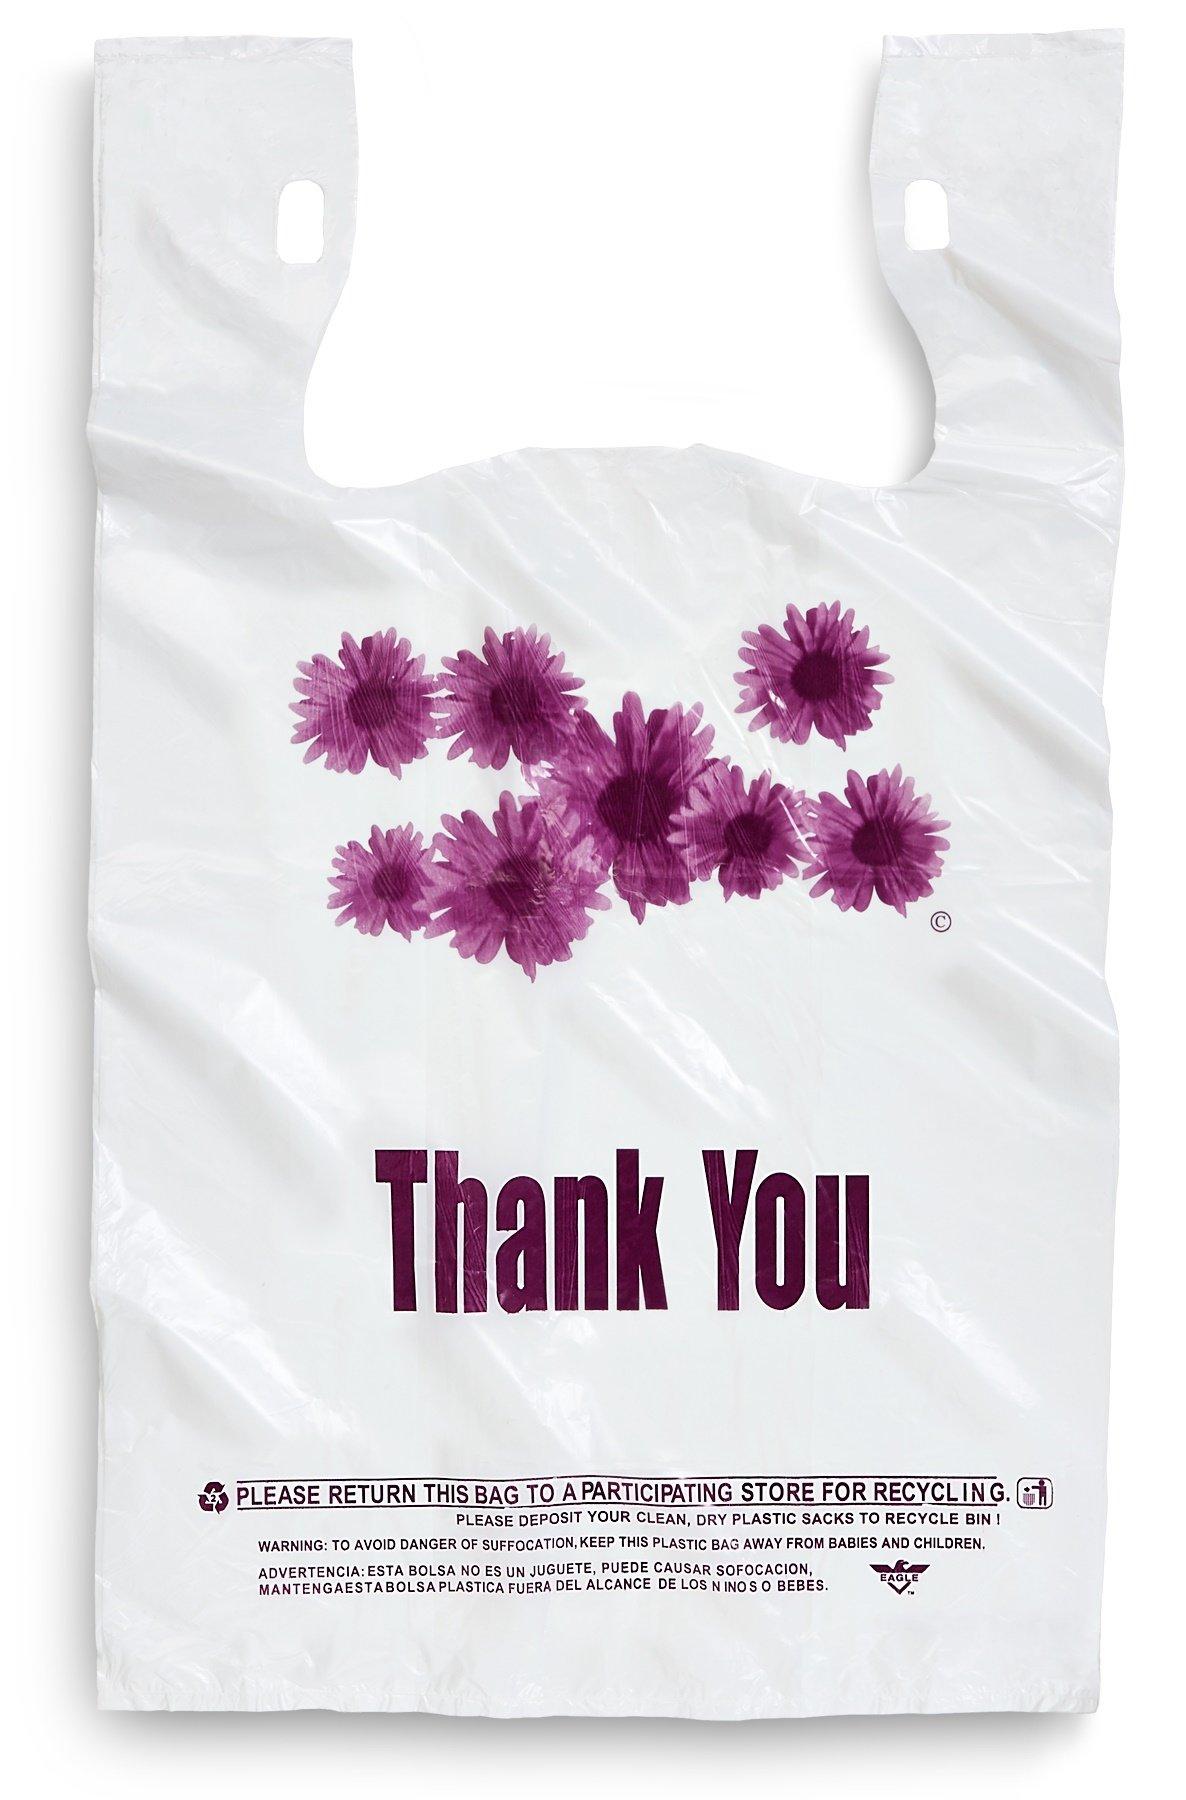 Purple Flower Thank You Plastic Shopping Bags - 500 pcs/case by Focus